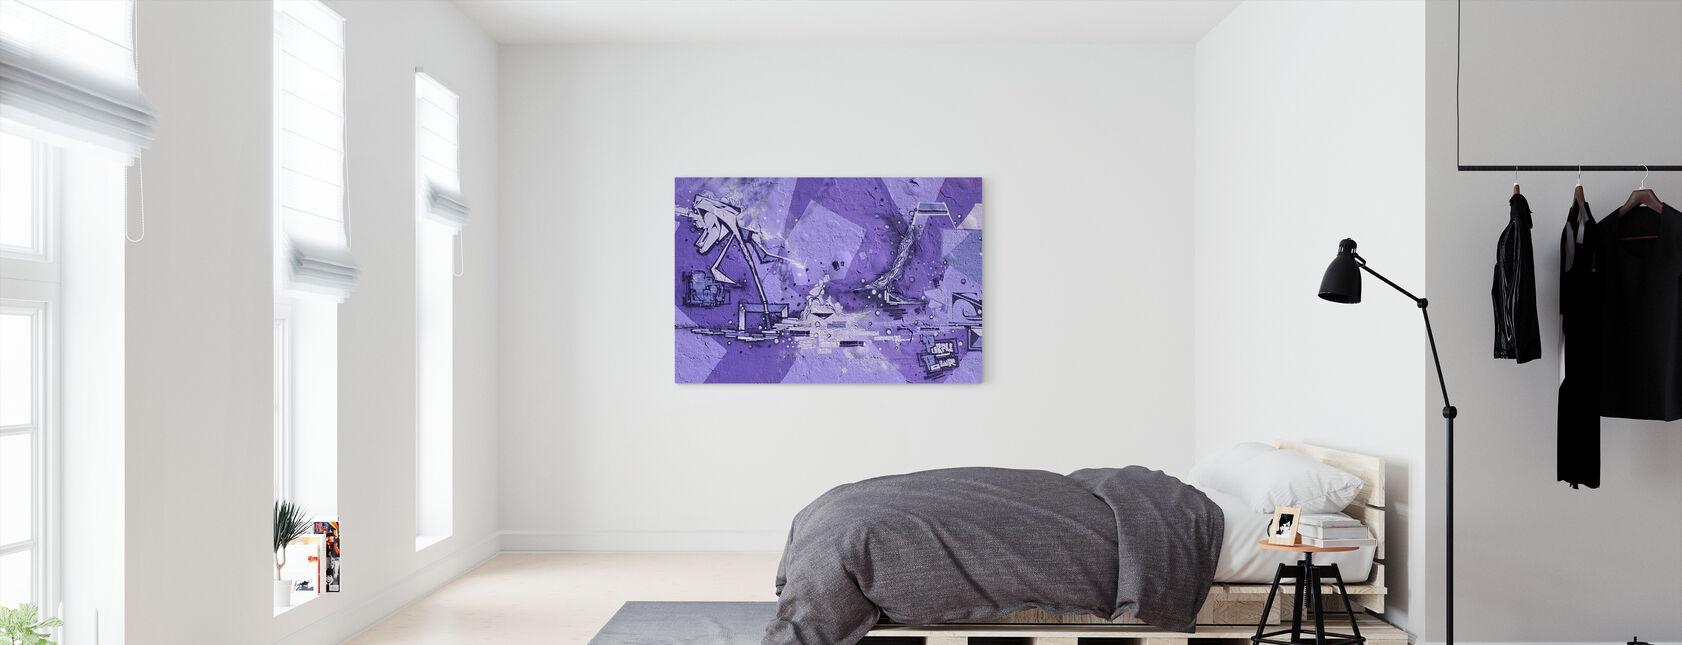 Purple Power Graffiti - Canvas print - Bedroom